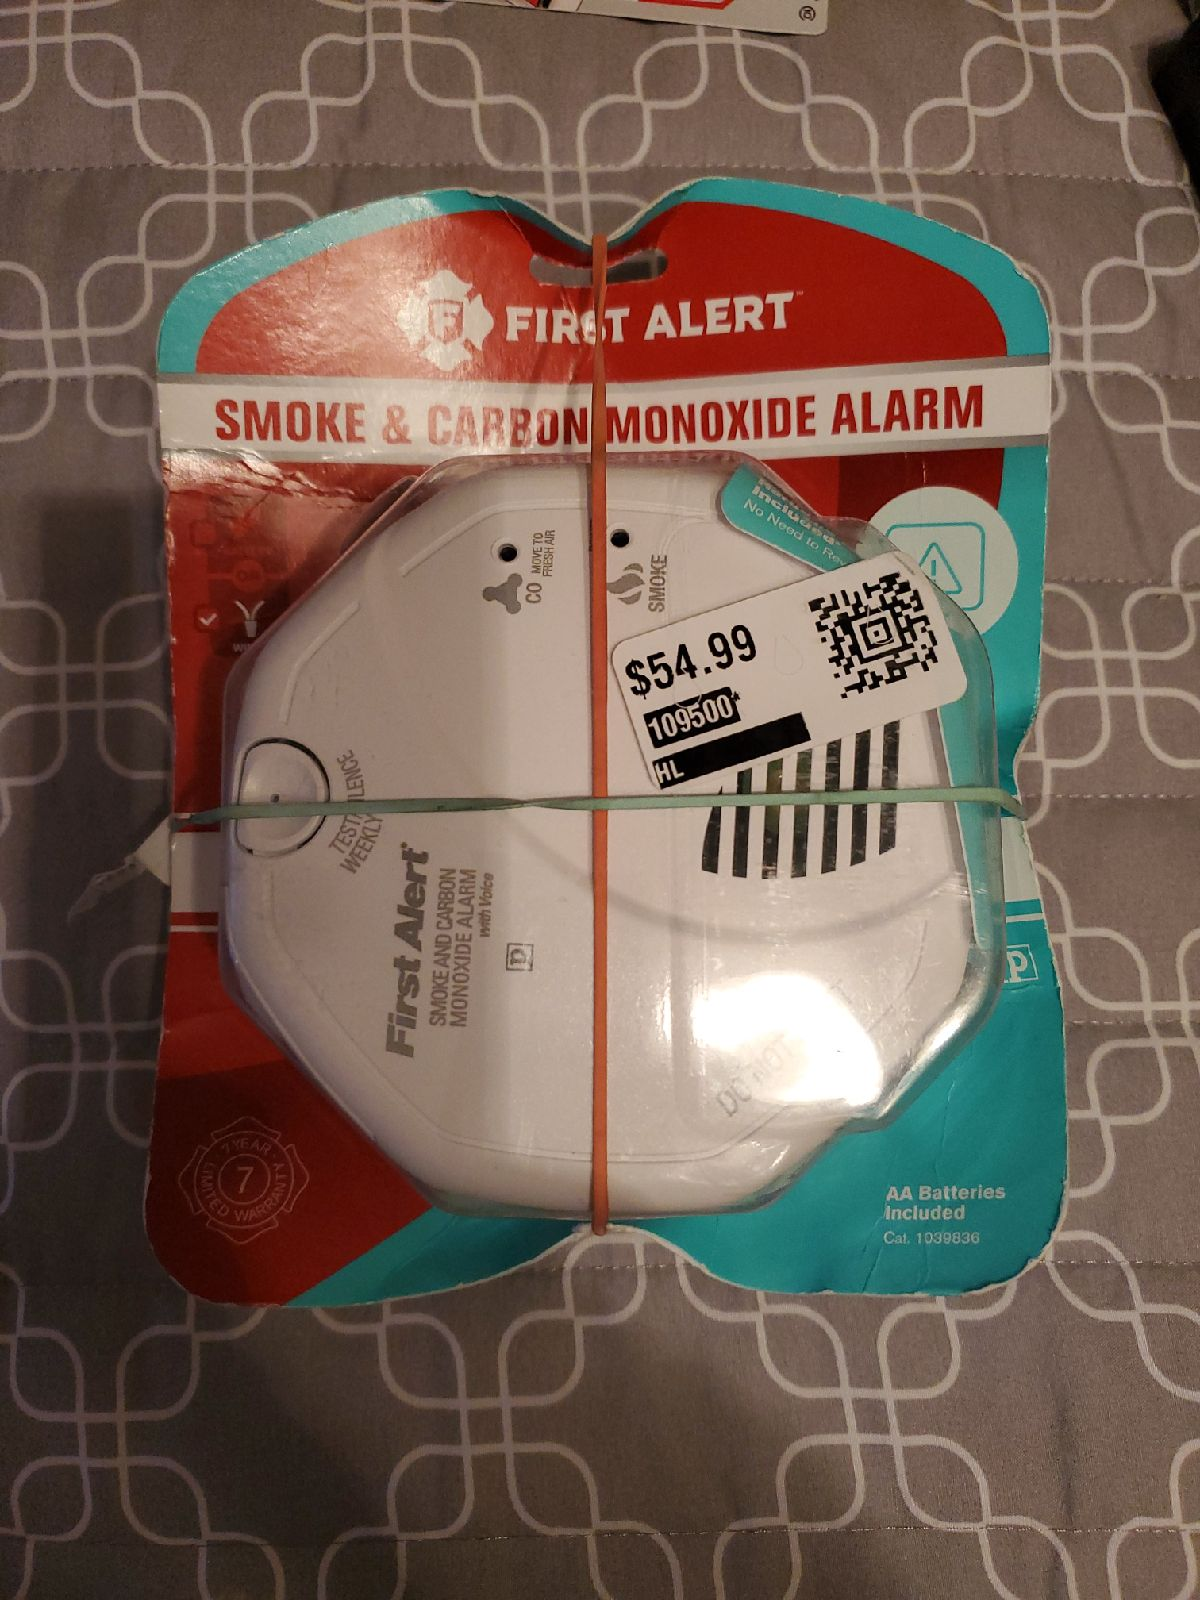 First Alert smoke and carbon monoxide al